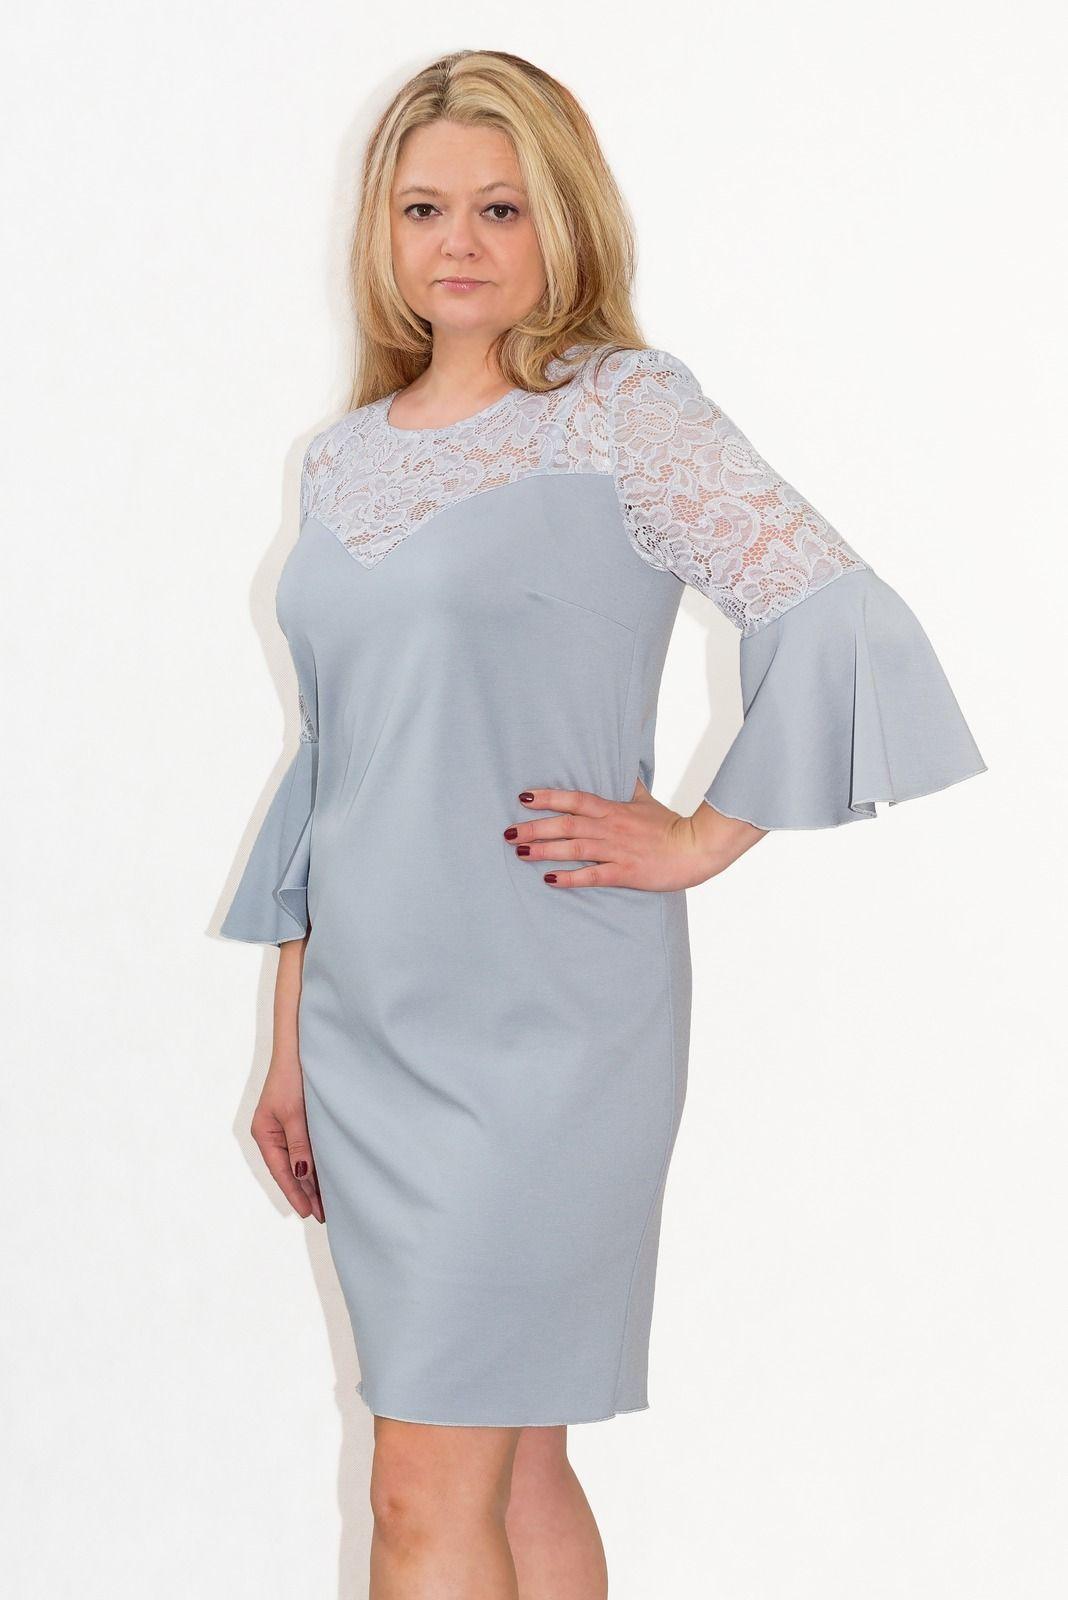 5b3a46b4d9 Elegancka sukienka XXL 40-60 na wesele PAOLA duże rozmiary - XELKA ...